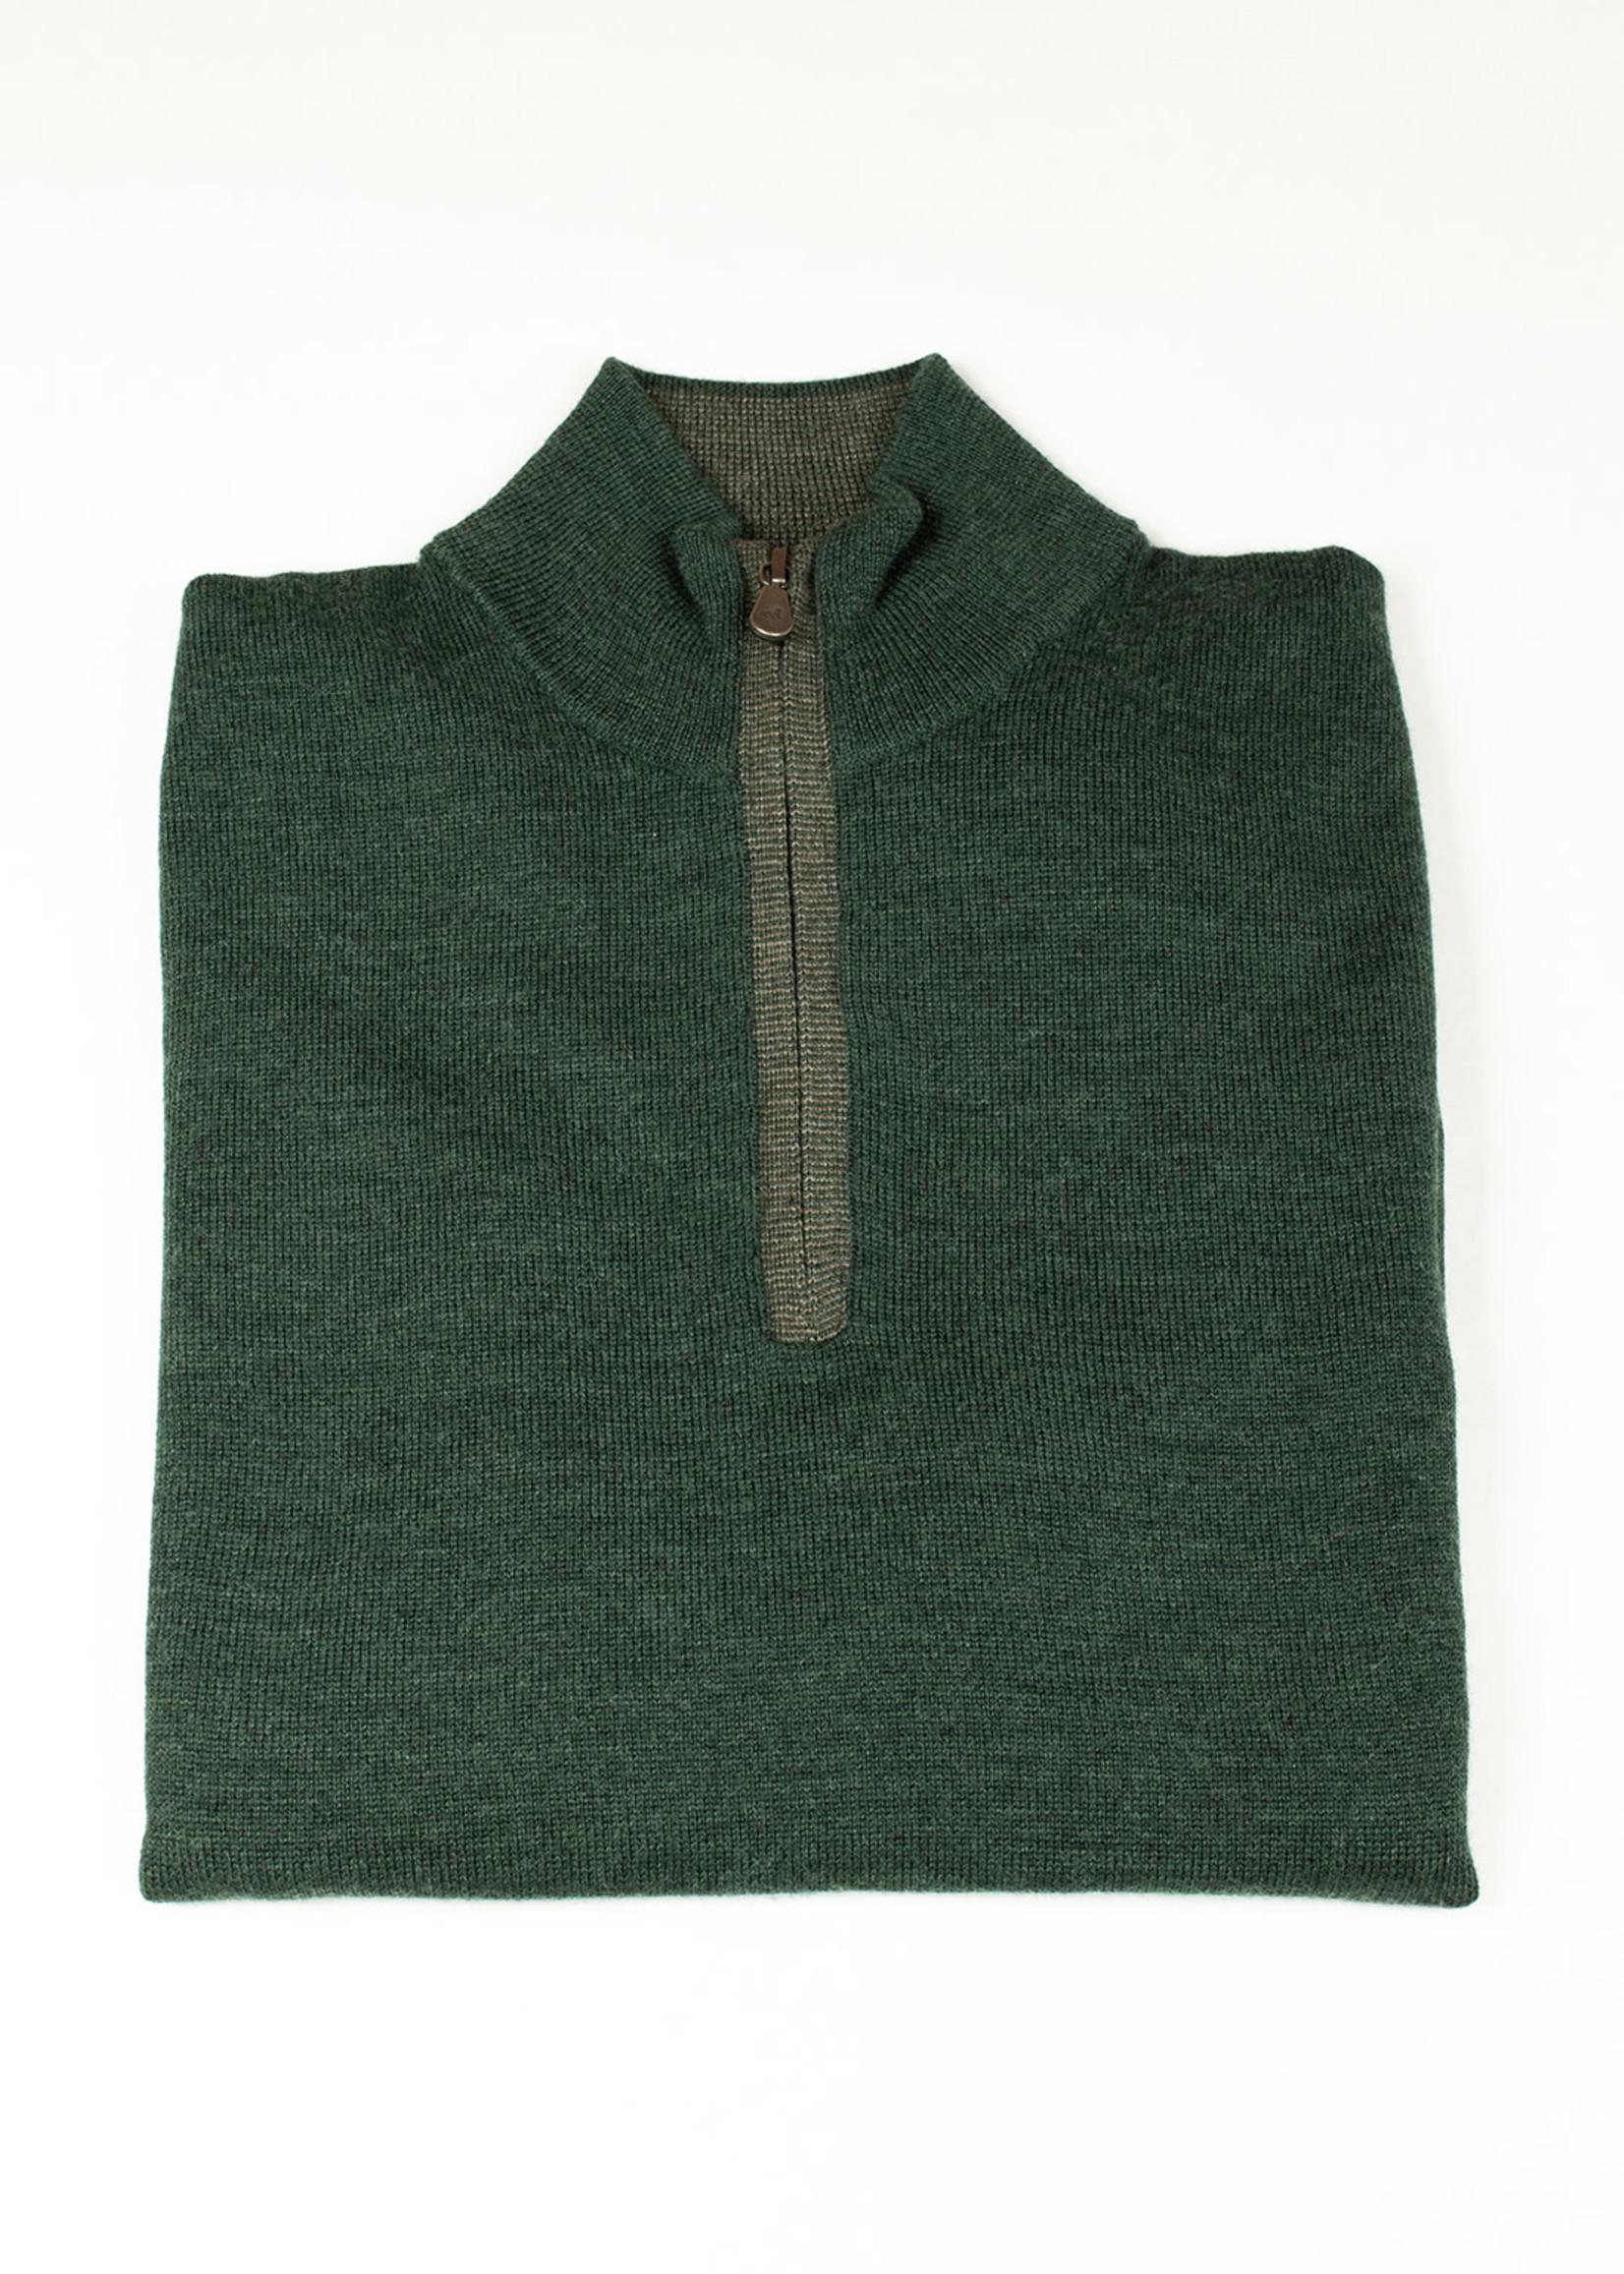 Raffi Raffi Forest Merino Wool 1/4 Zip b